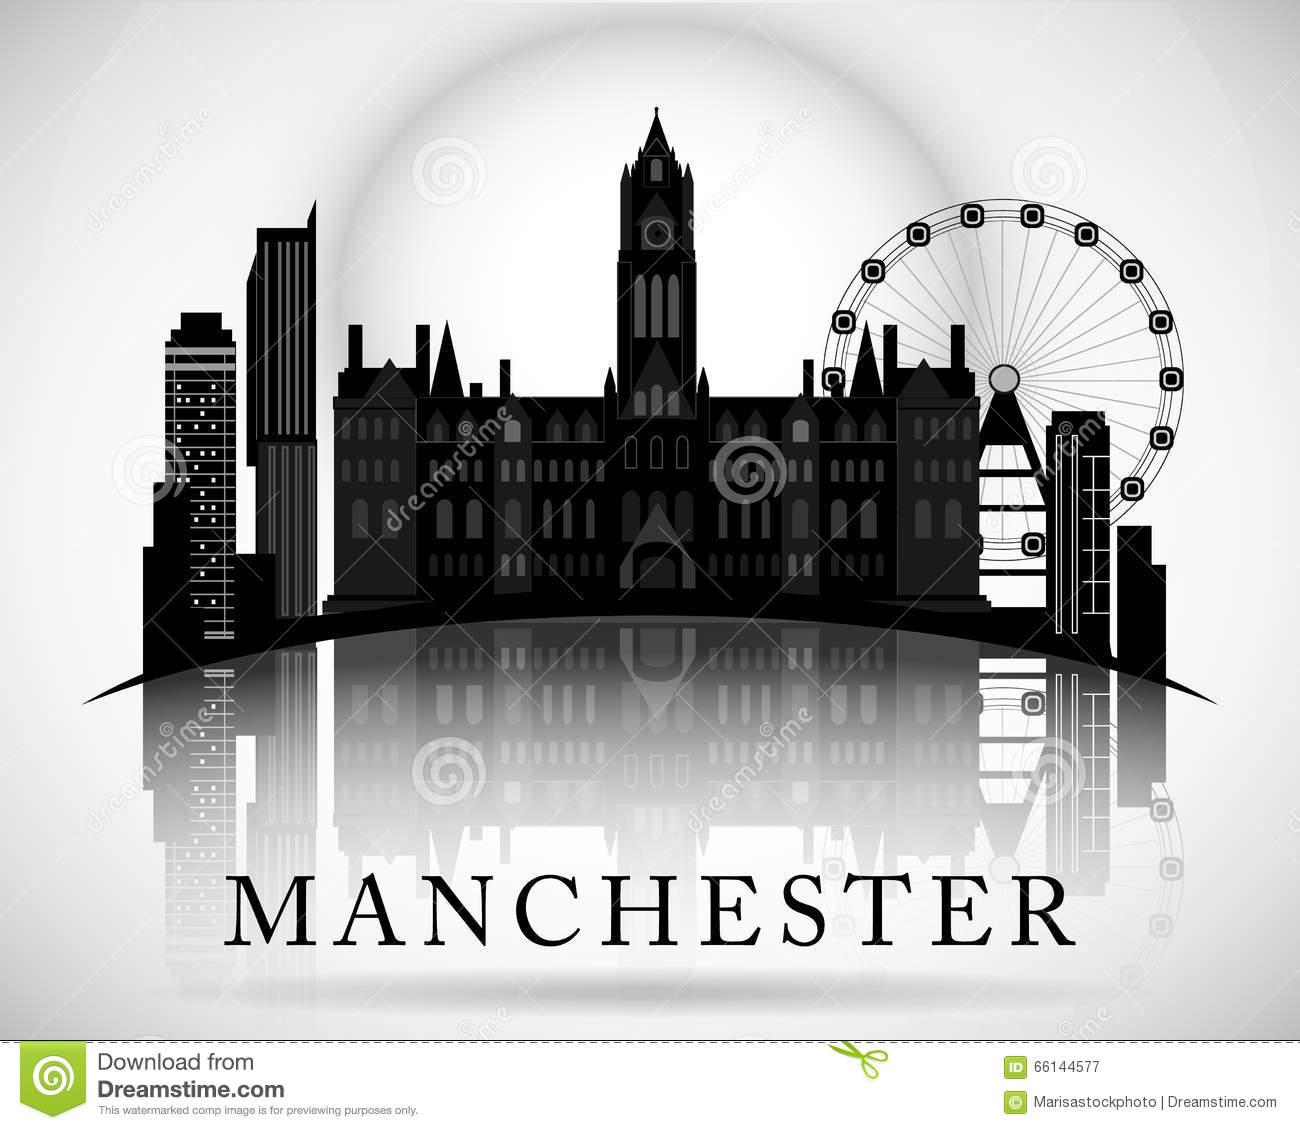 Manchester Stock Illustrations.